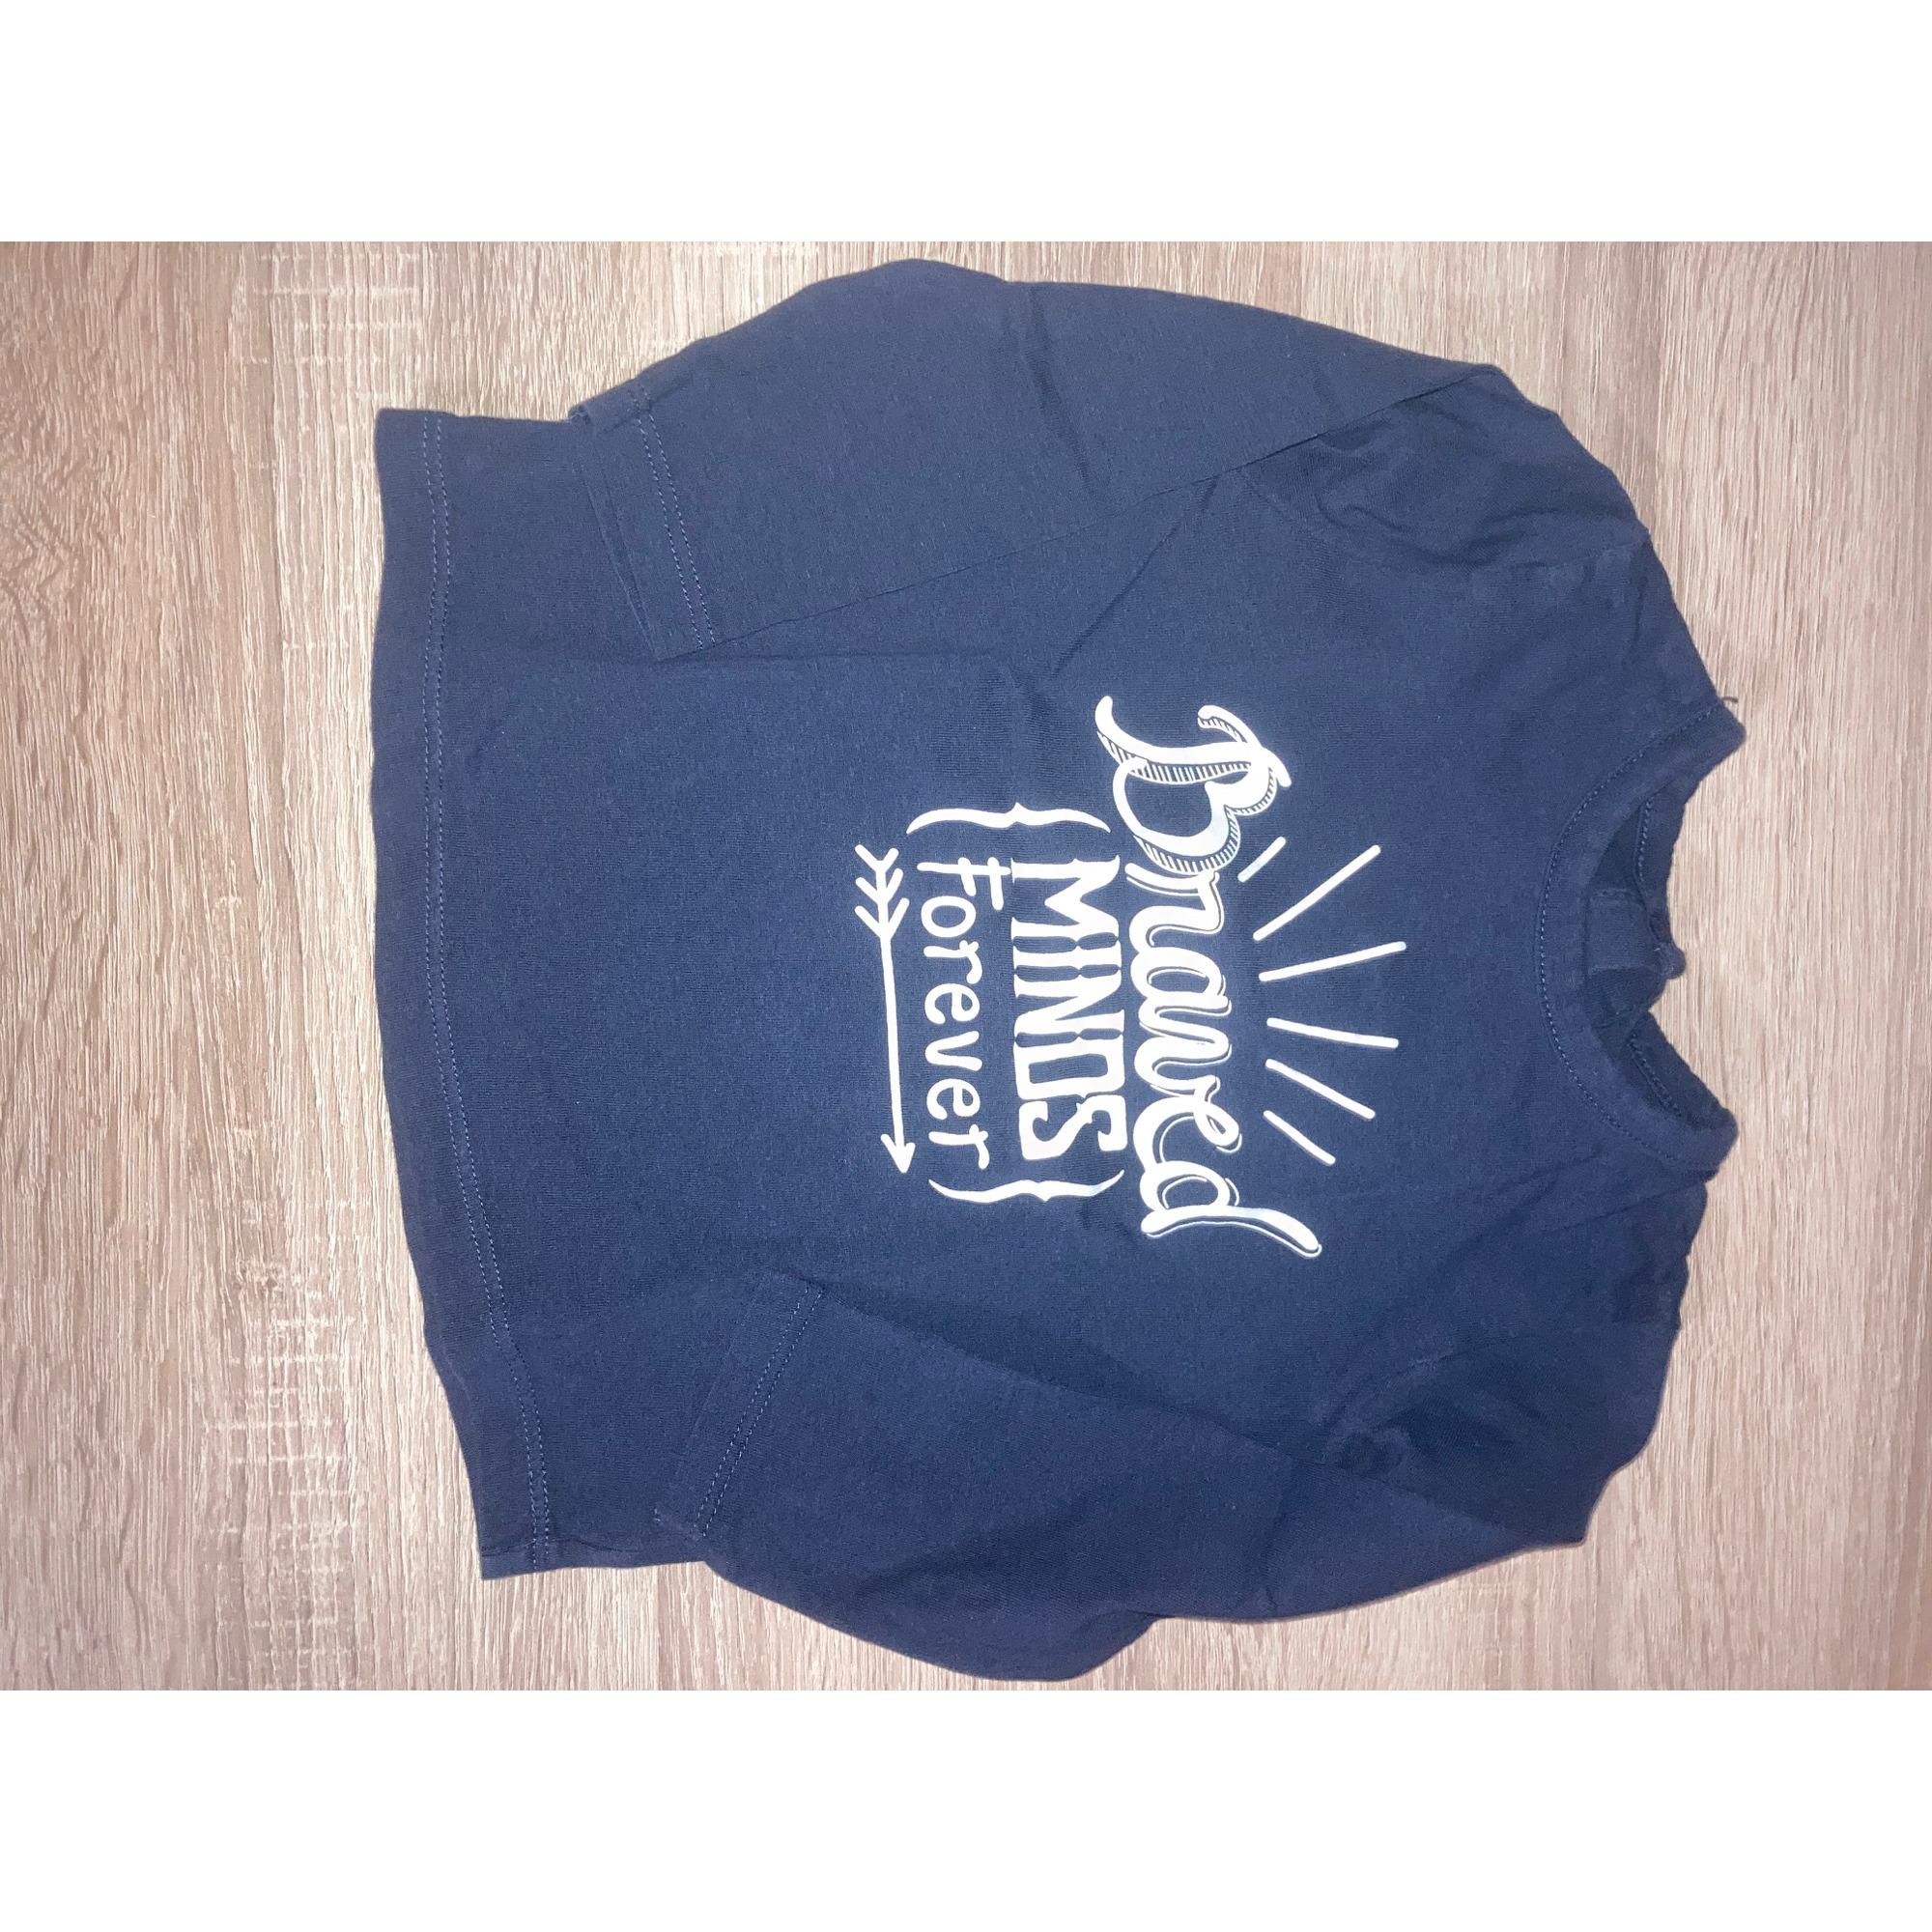 Top, tee shirt LA REDOUTE Bleu, bleu marine, bleu turquoise